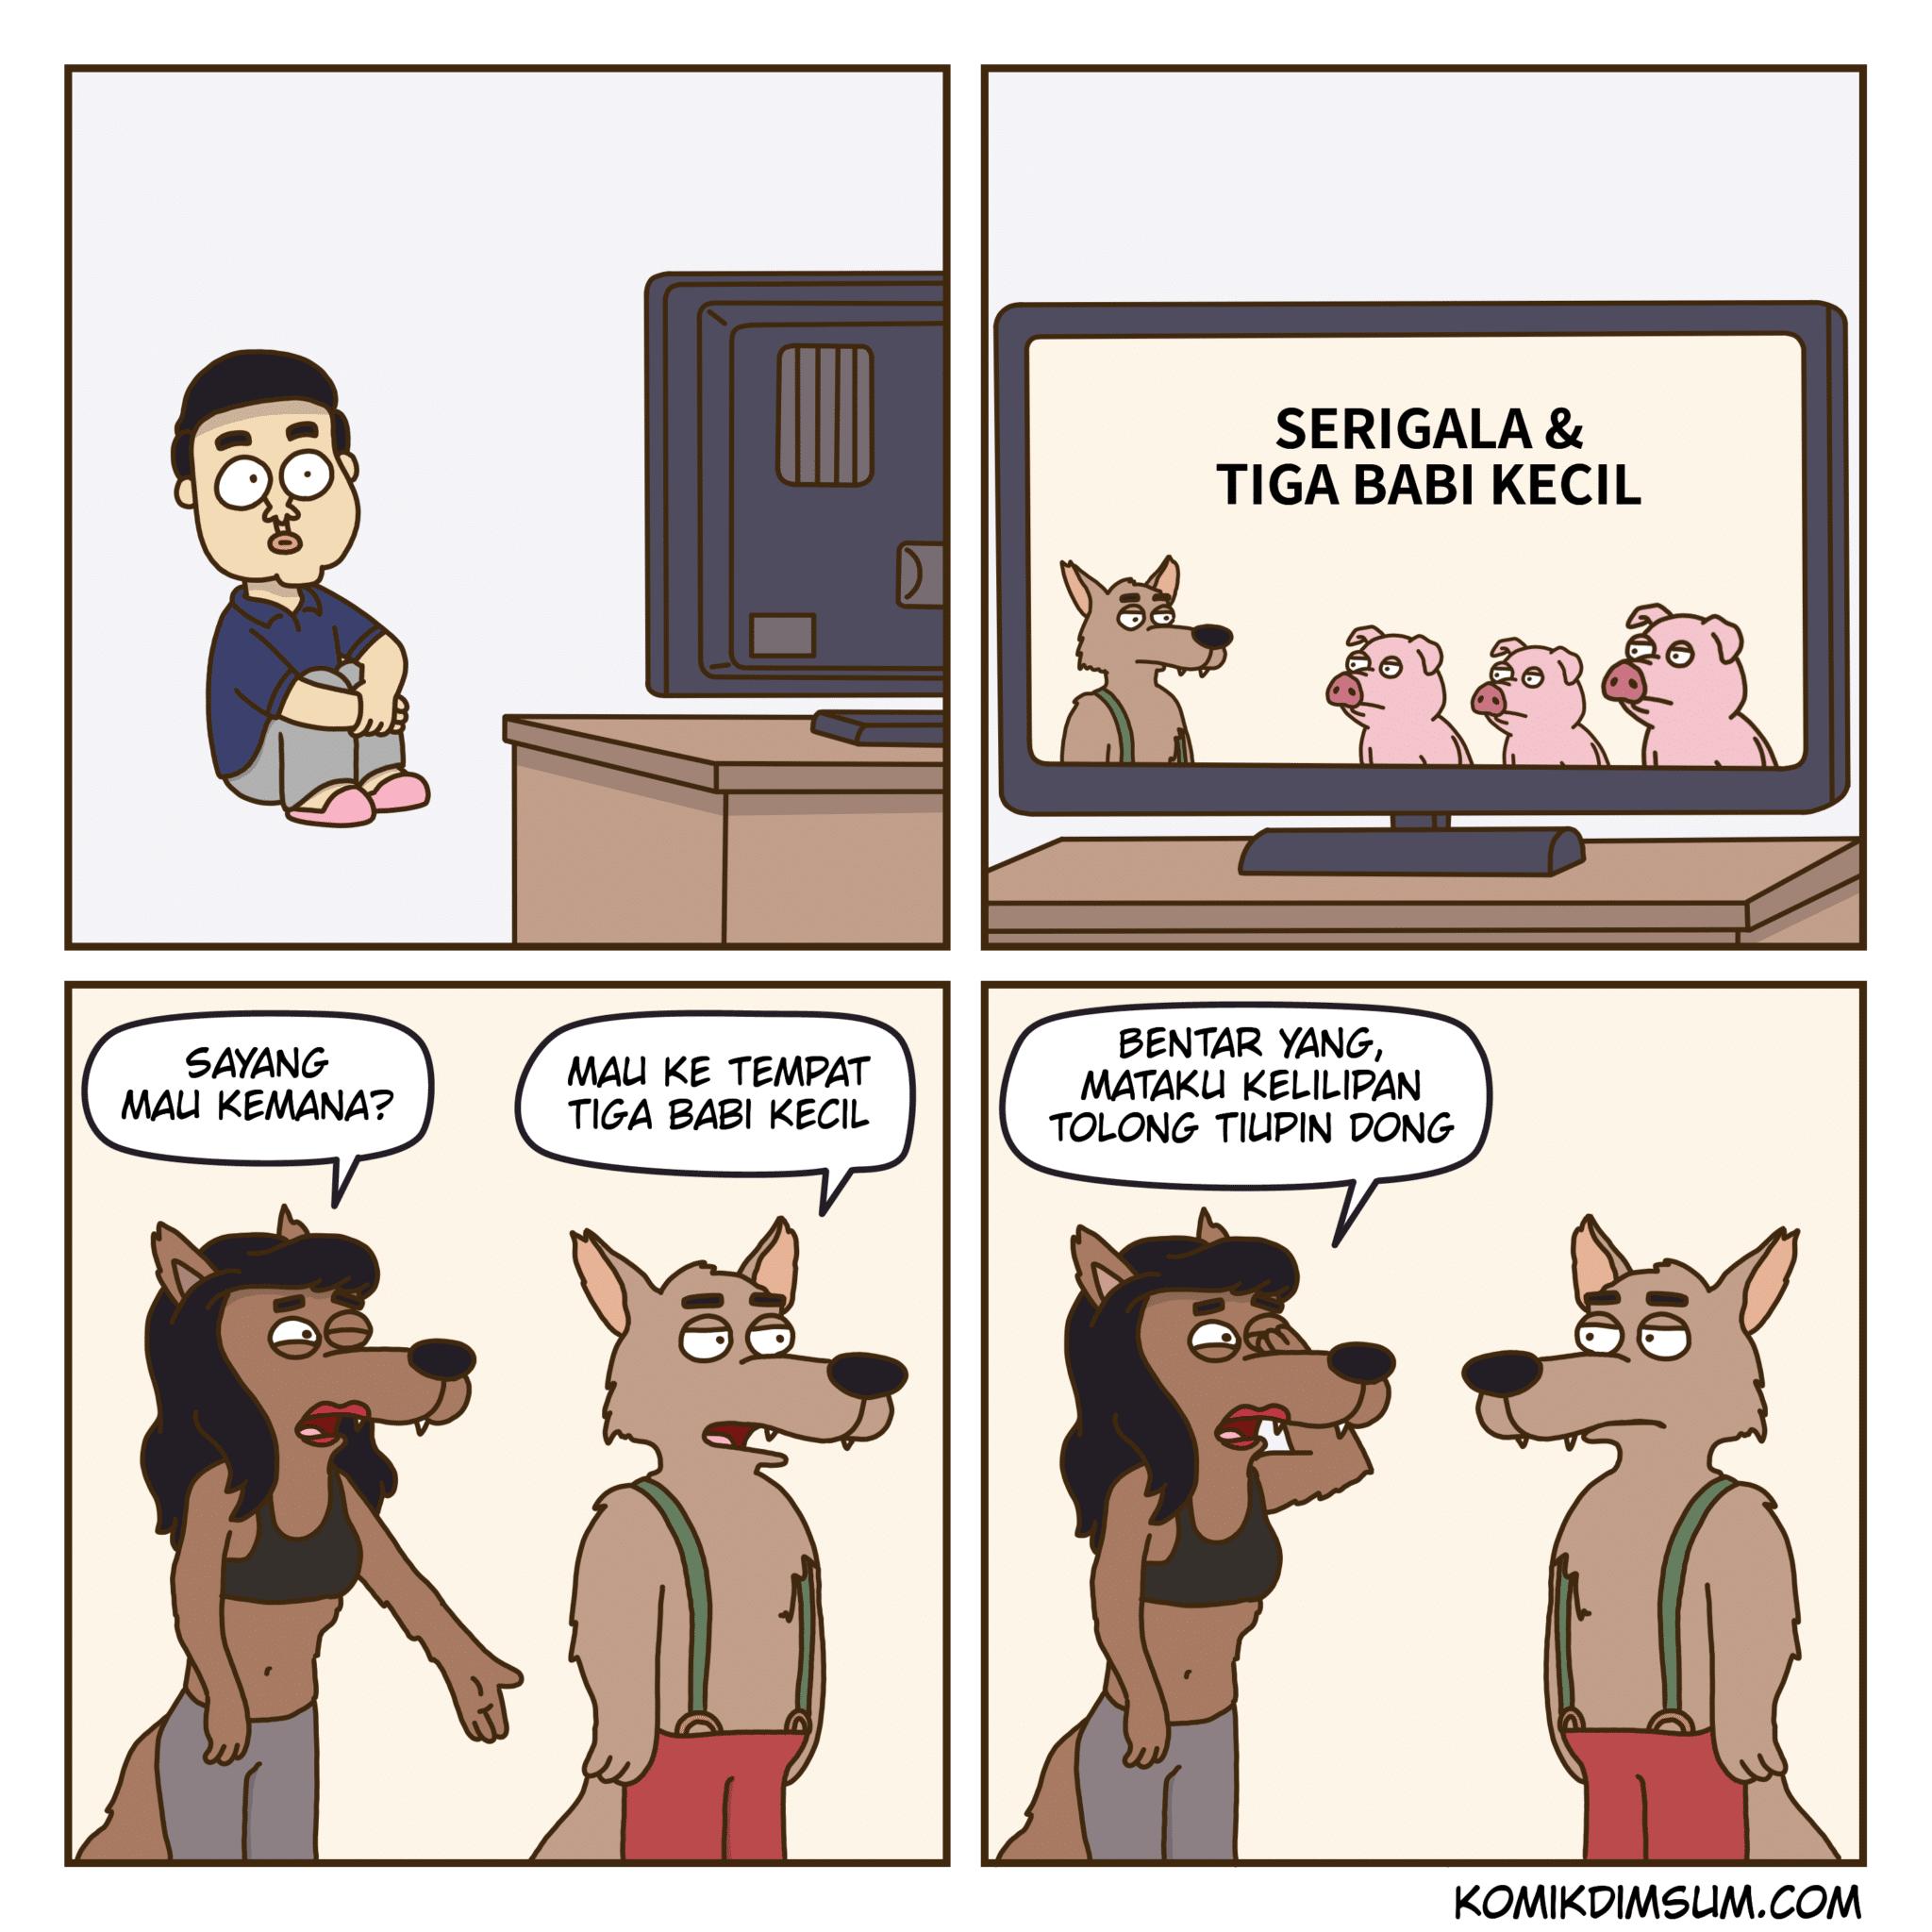 Serigala Dan Tiga Babi Kecil